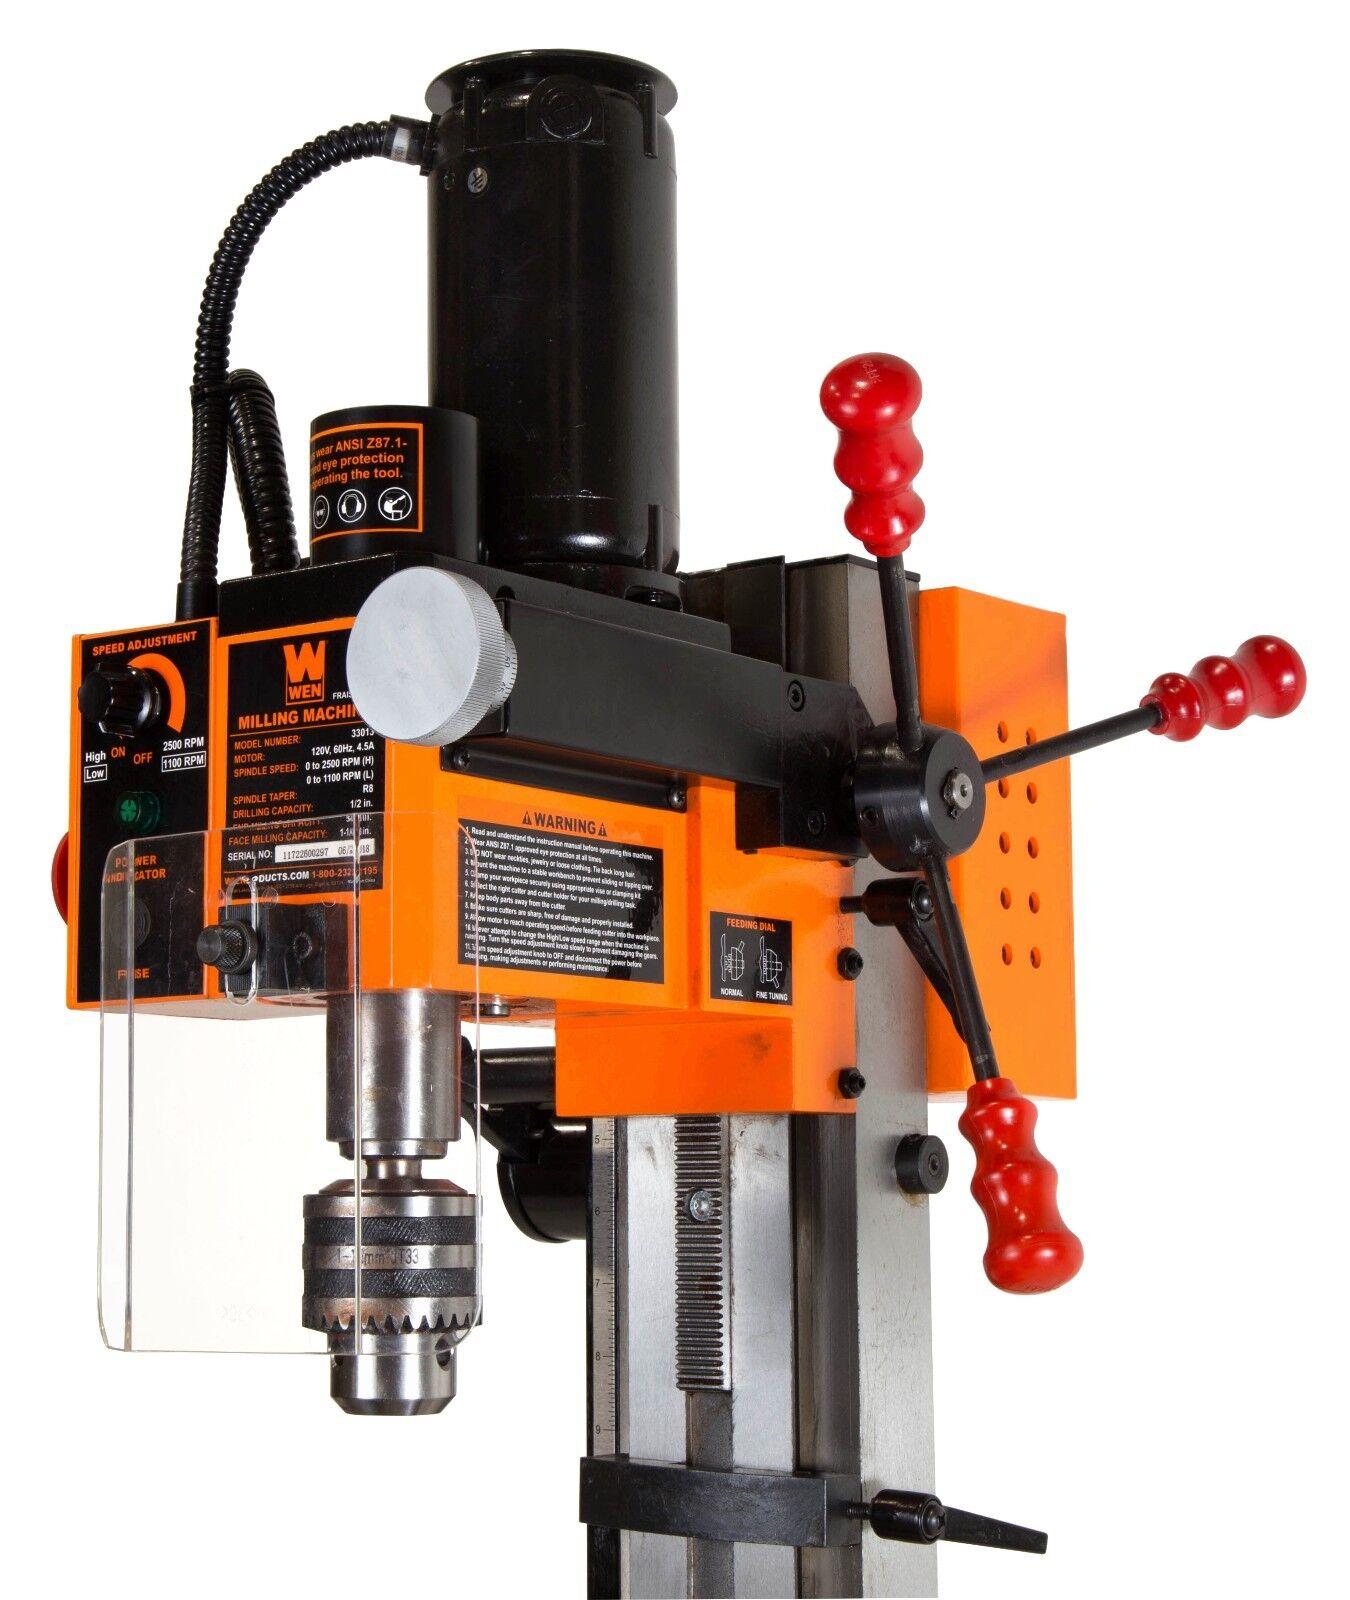 WEN 33108A 8-Piece 2-Flute HSS End Mill Set for Milling Machines